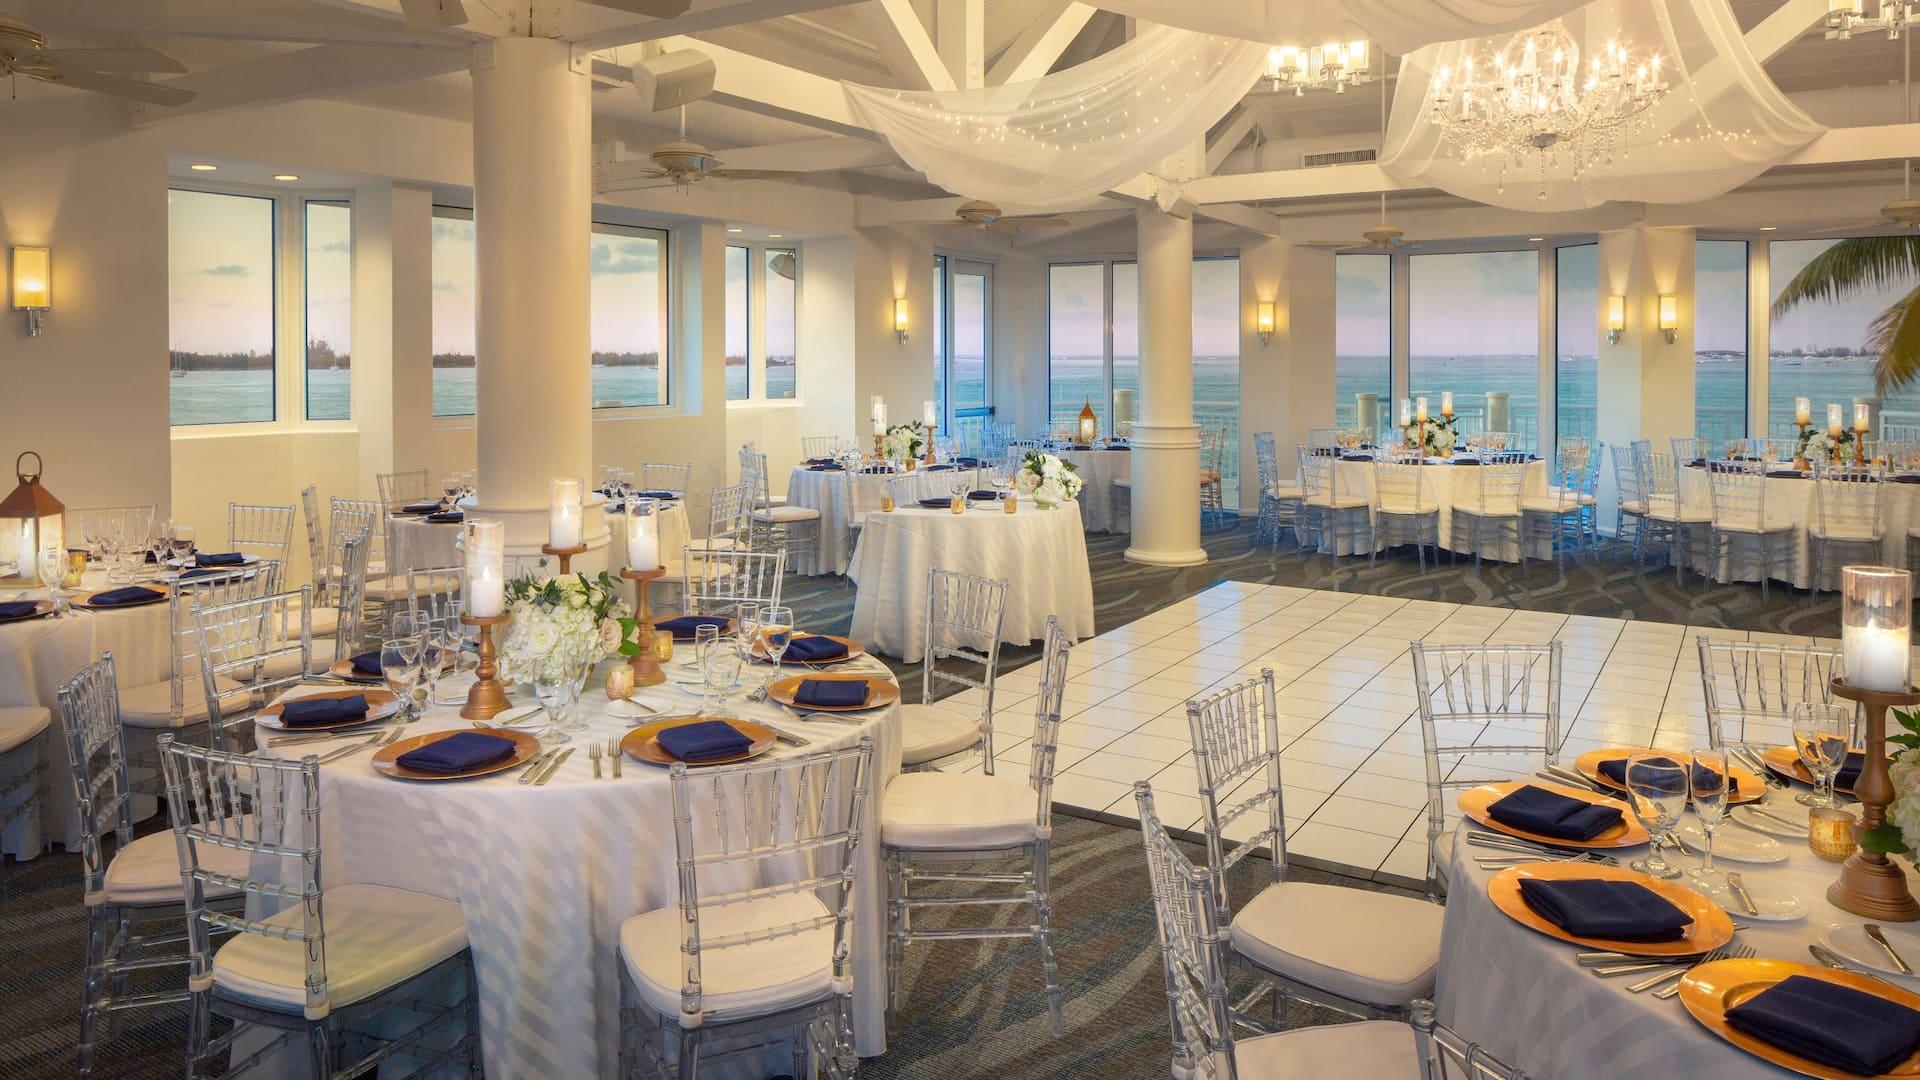 Hyatt Centric Key West Banquet Wedding Setup